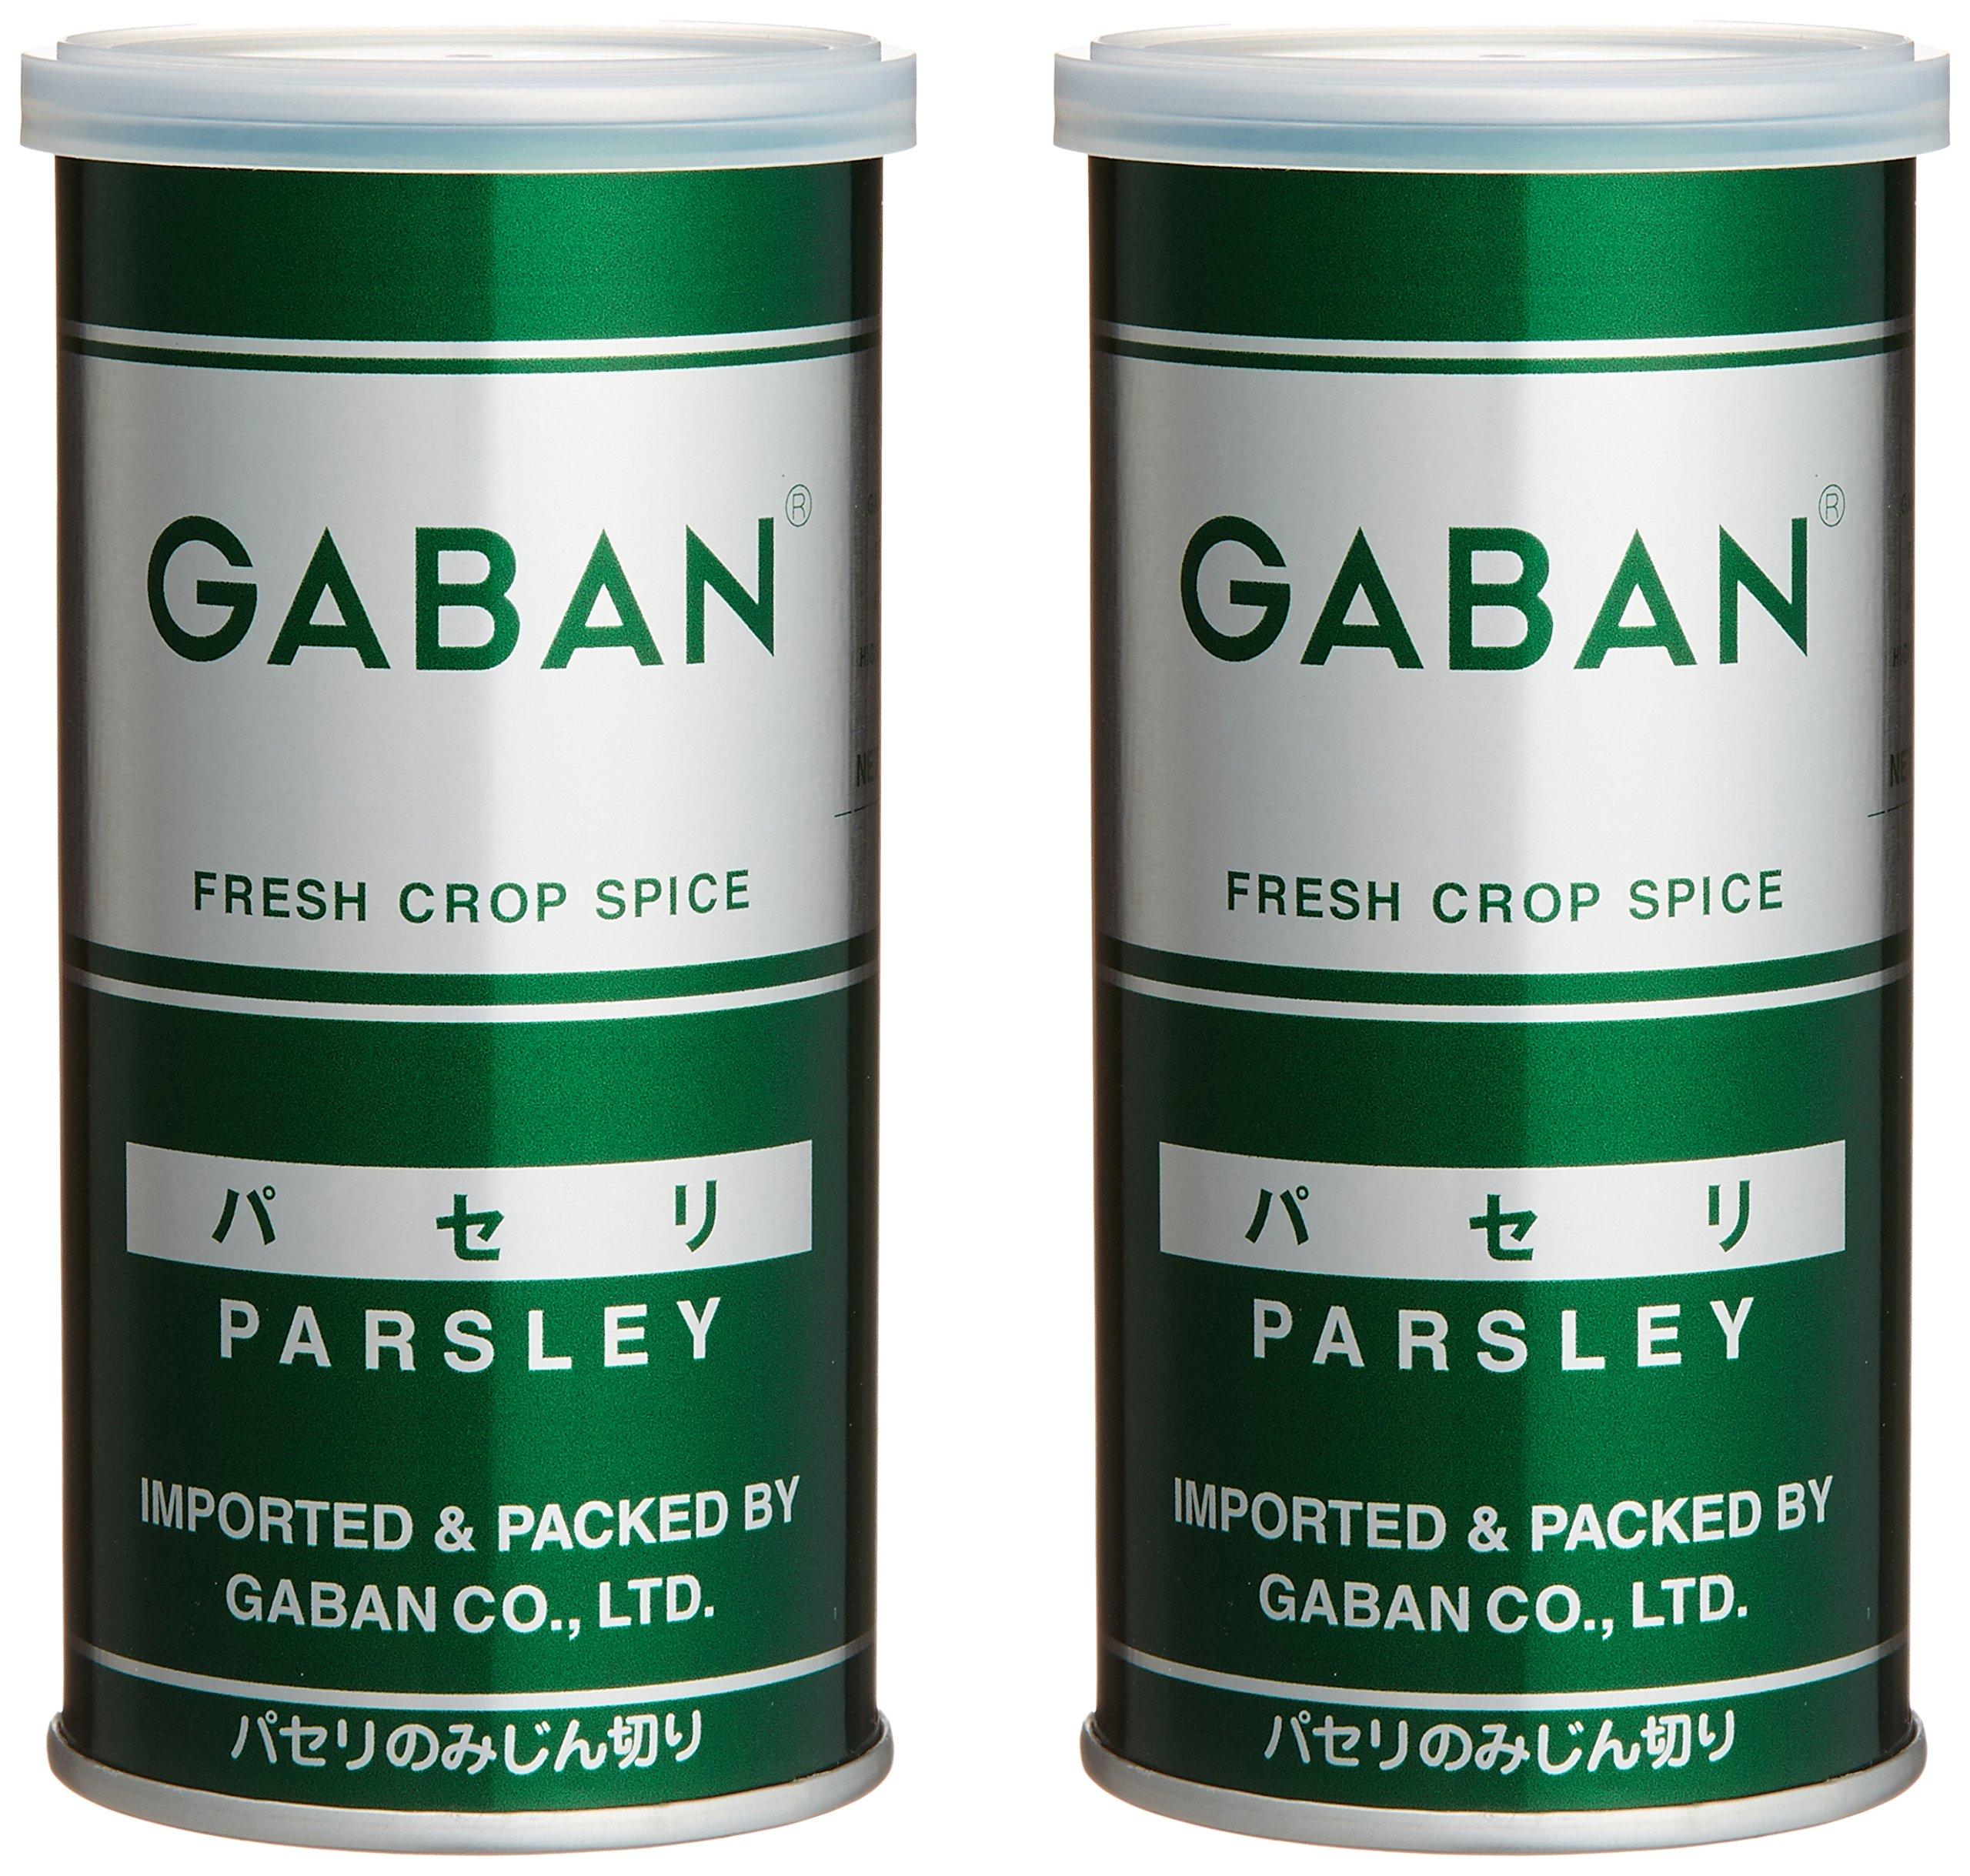 Parsley (chopped) 16gX2 cans